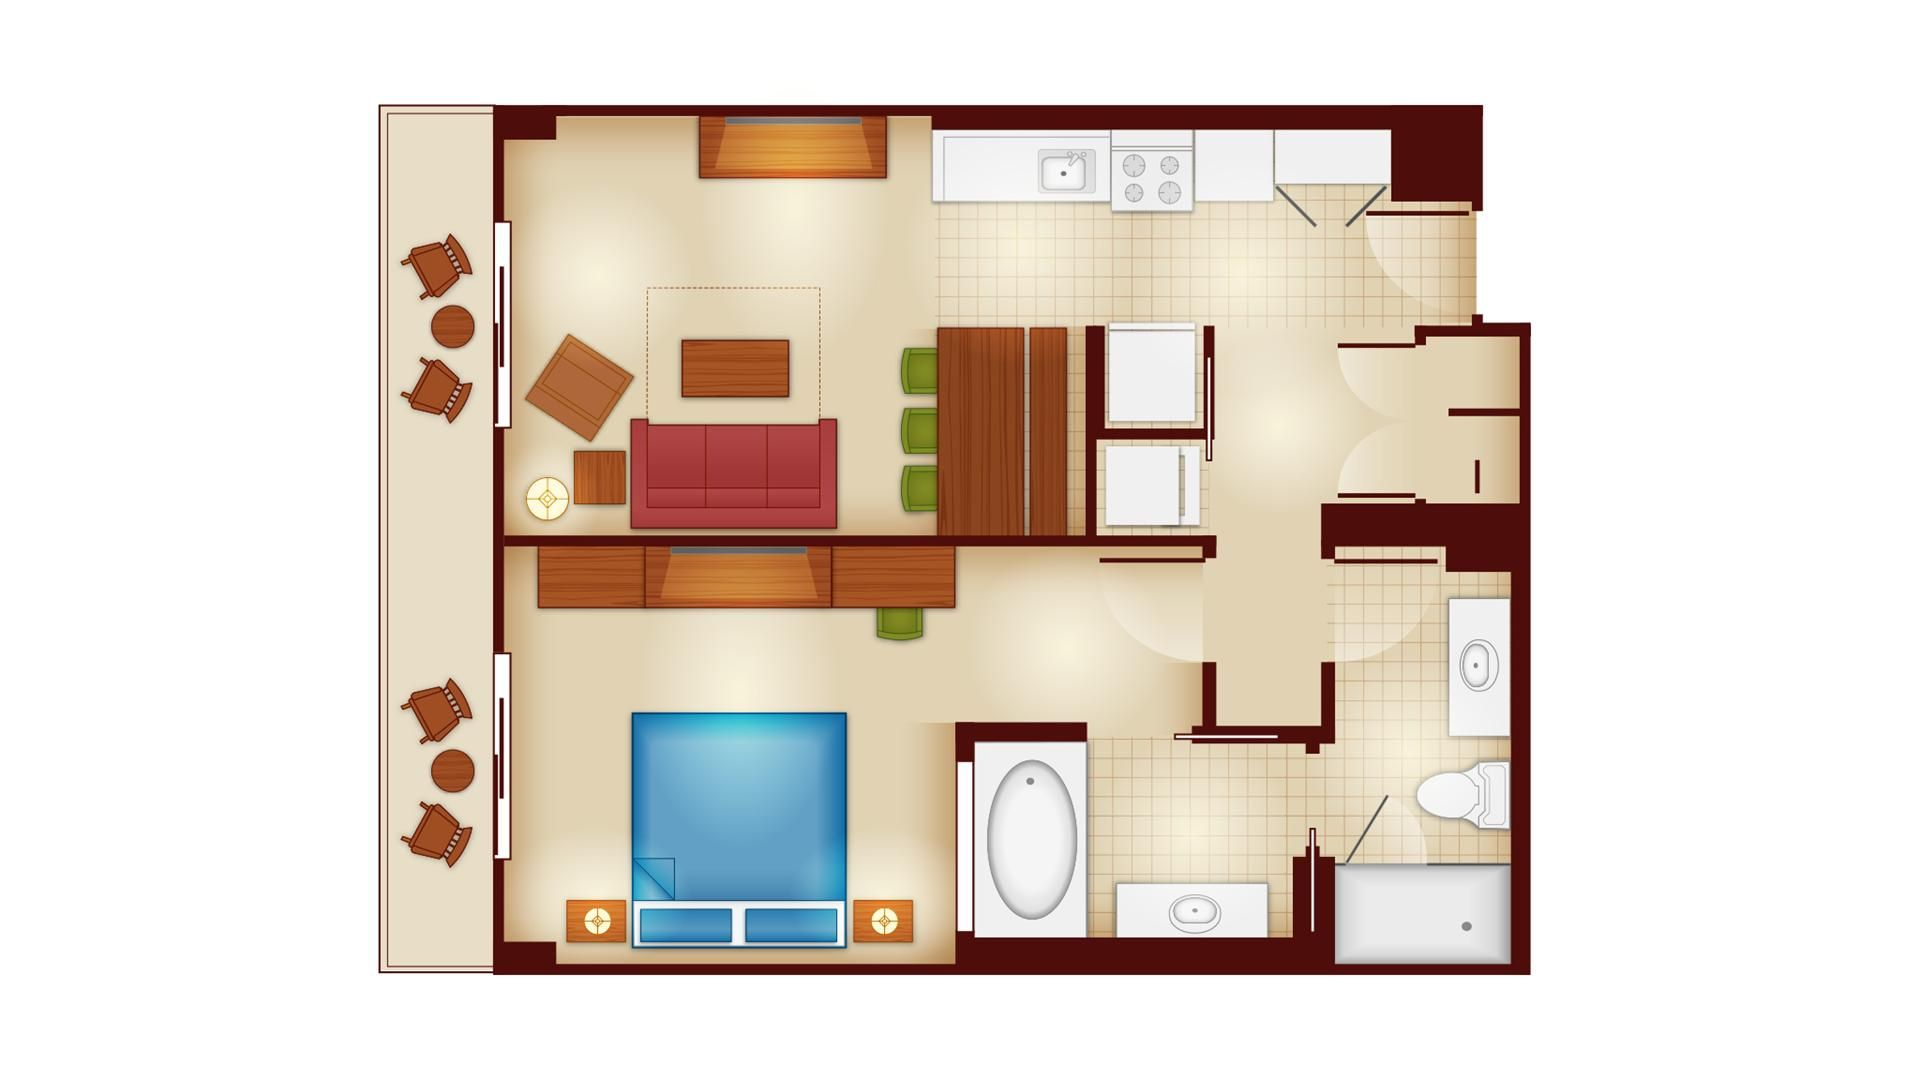 Copper Creek Villas And Cabins 1 Bedroom Villa Floor Plan Wilderness Lodge Disney Wilderness Lodge Lodge